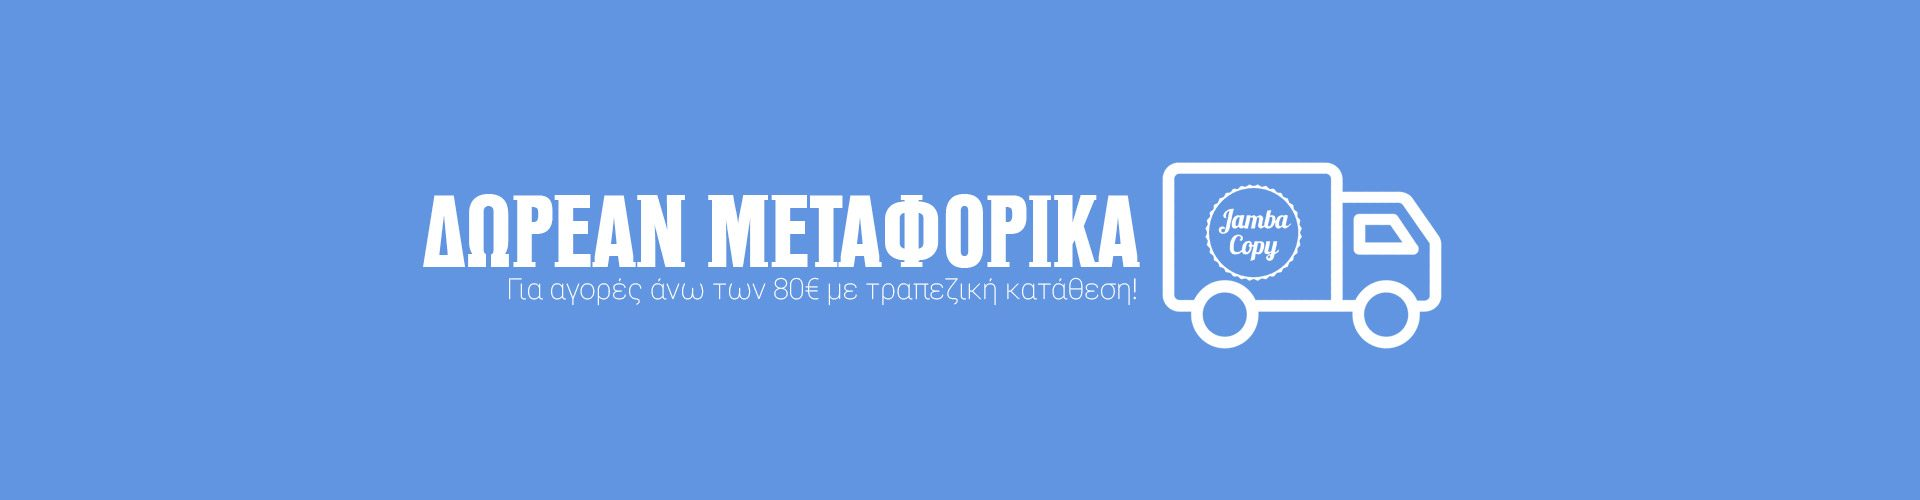 jambacopy-homepage-banner-metaforika-desktop